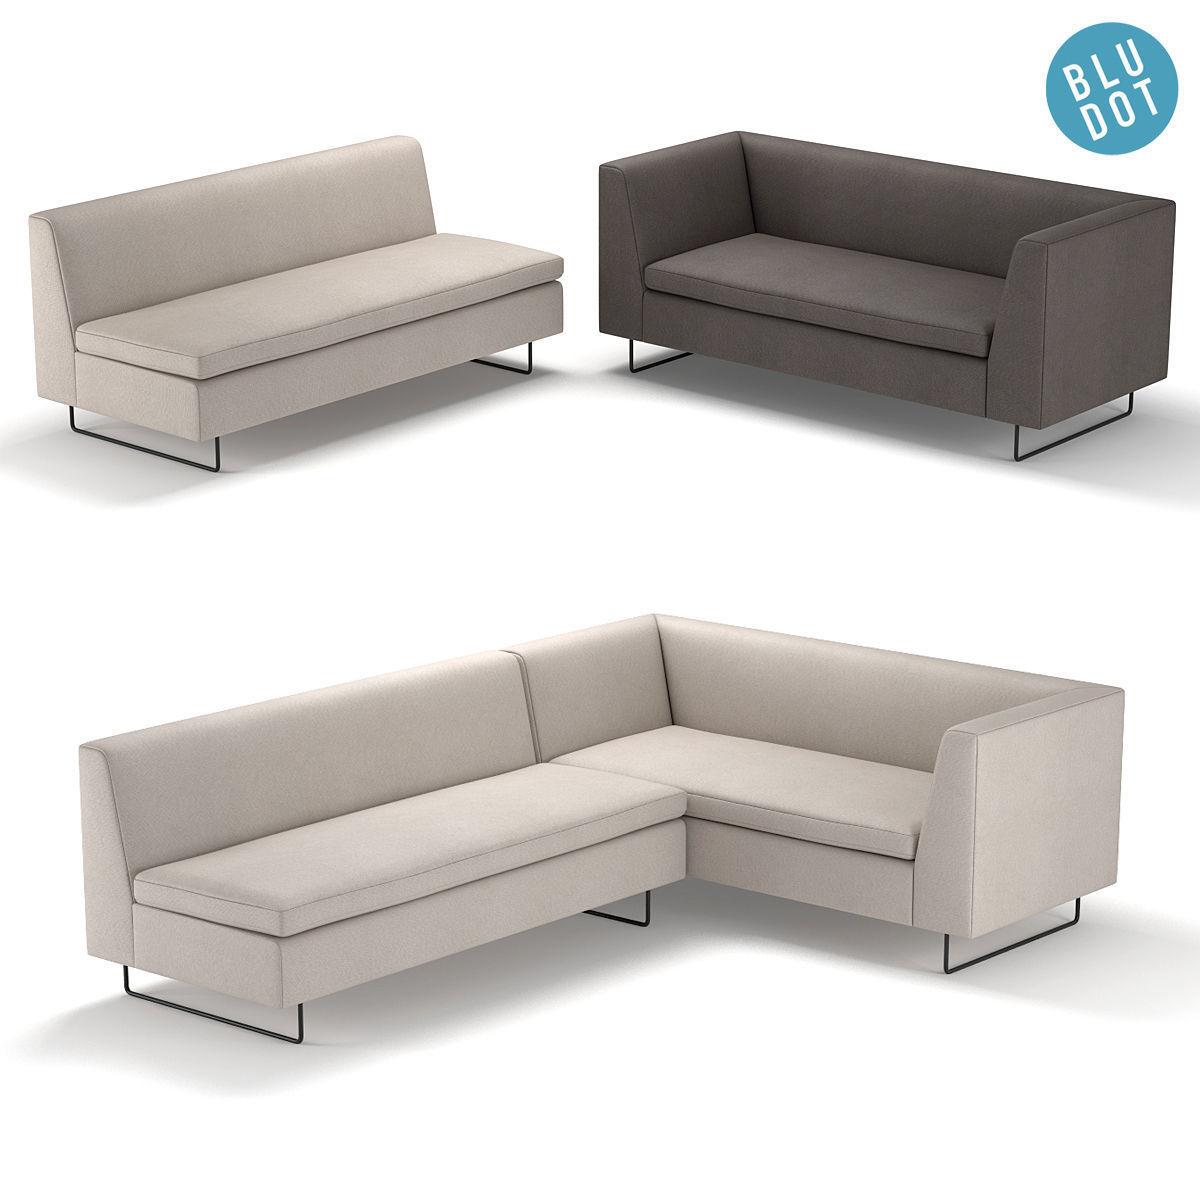 Blu Dot Bonnie and Clyde Sofa | 3D model